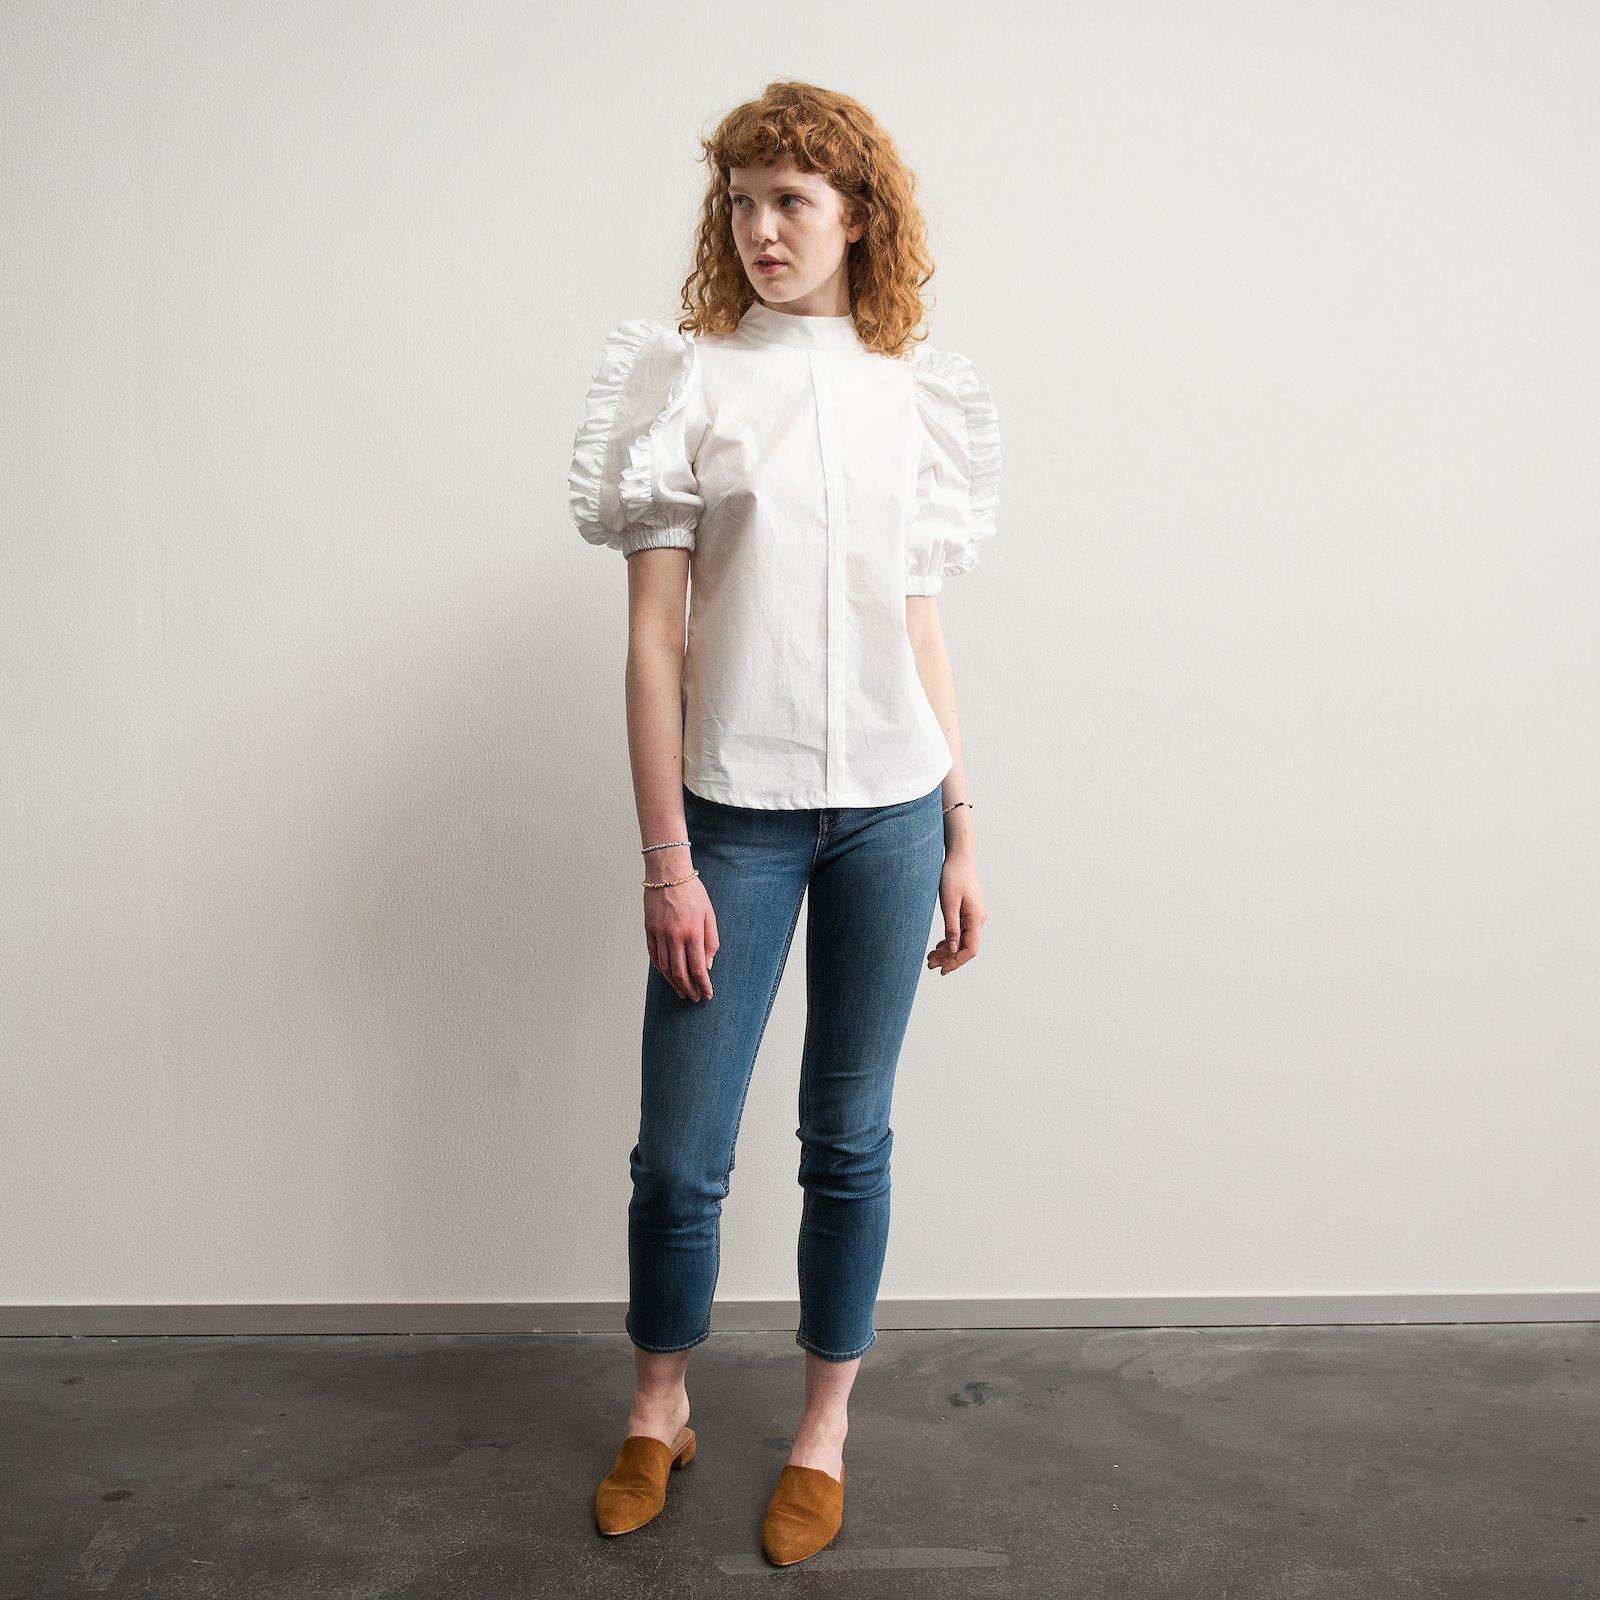 Design your own blouse, 44/16 p22075_540111_33023_DIY8020_sskit